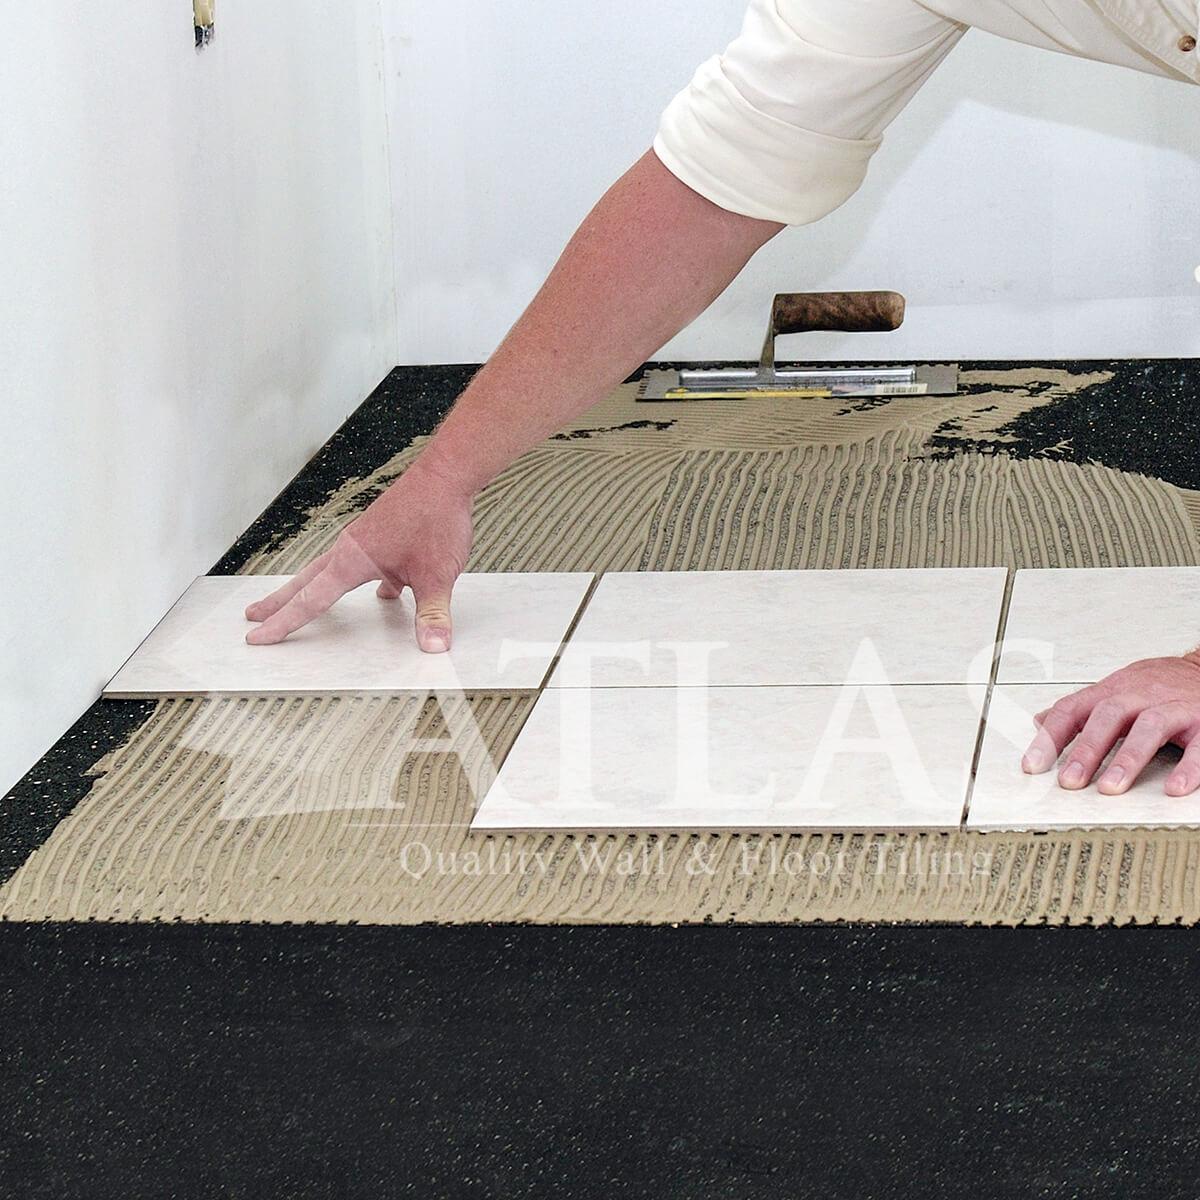 Acoustic Insulation Services : Sound insulation floor tiles gurus